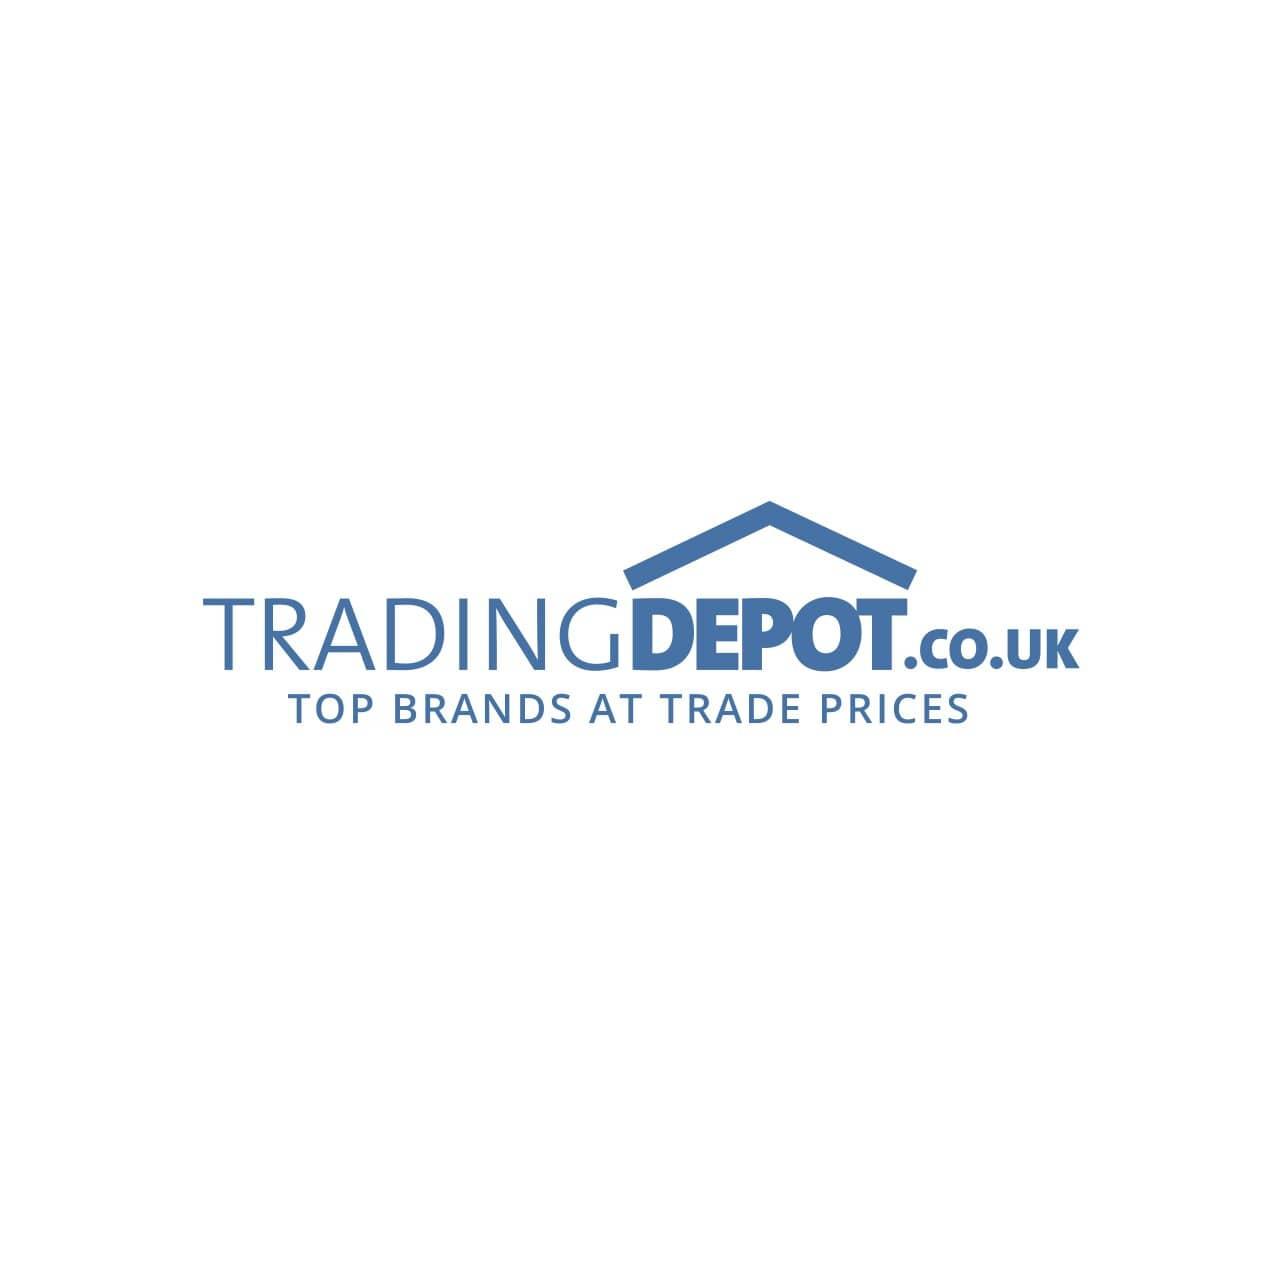 Velux Coupled Tile Flashing For 100mm Gap 134 x 140cm - EKW UK08 0021E